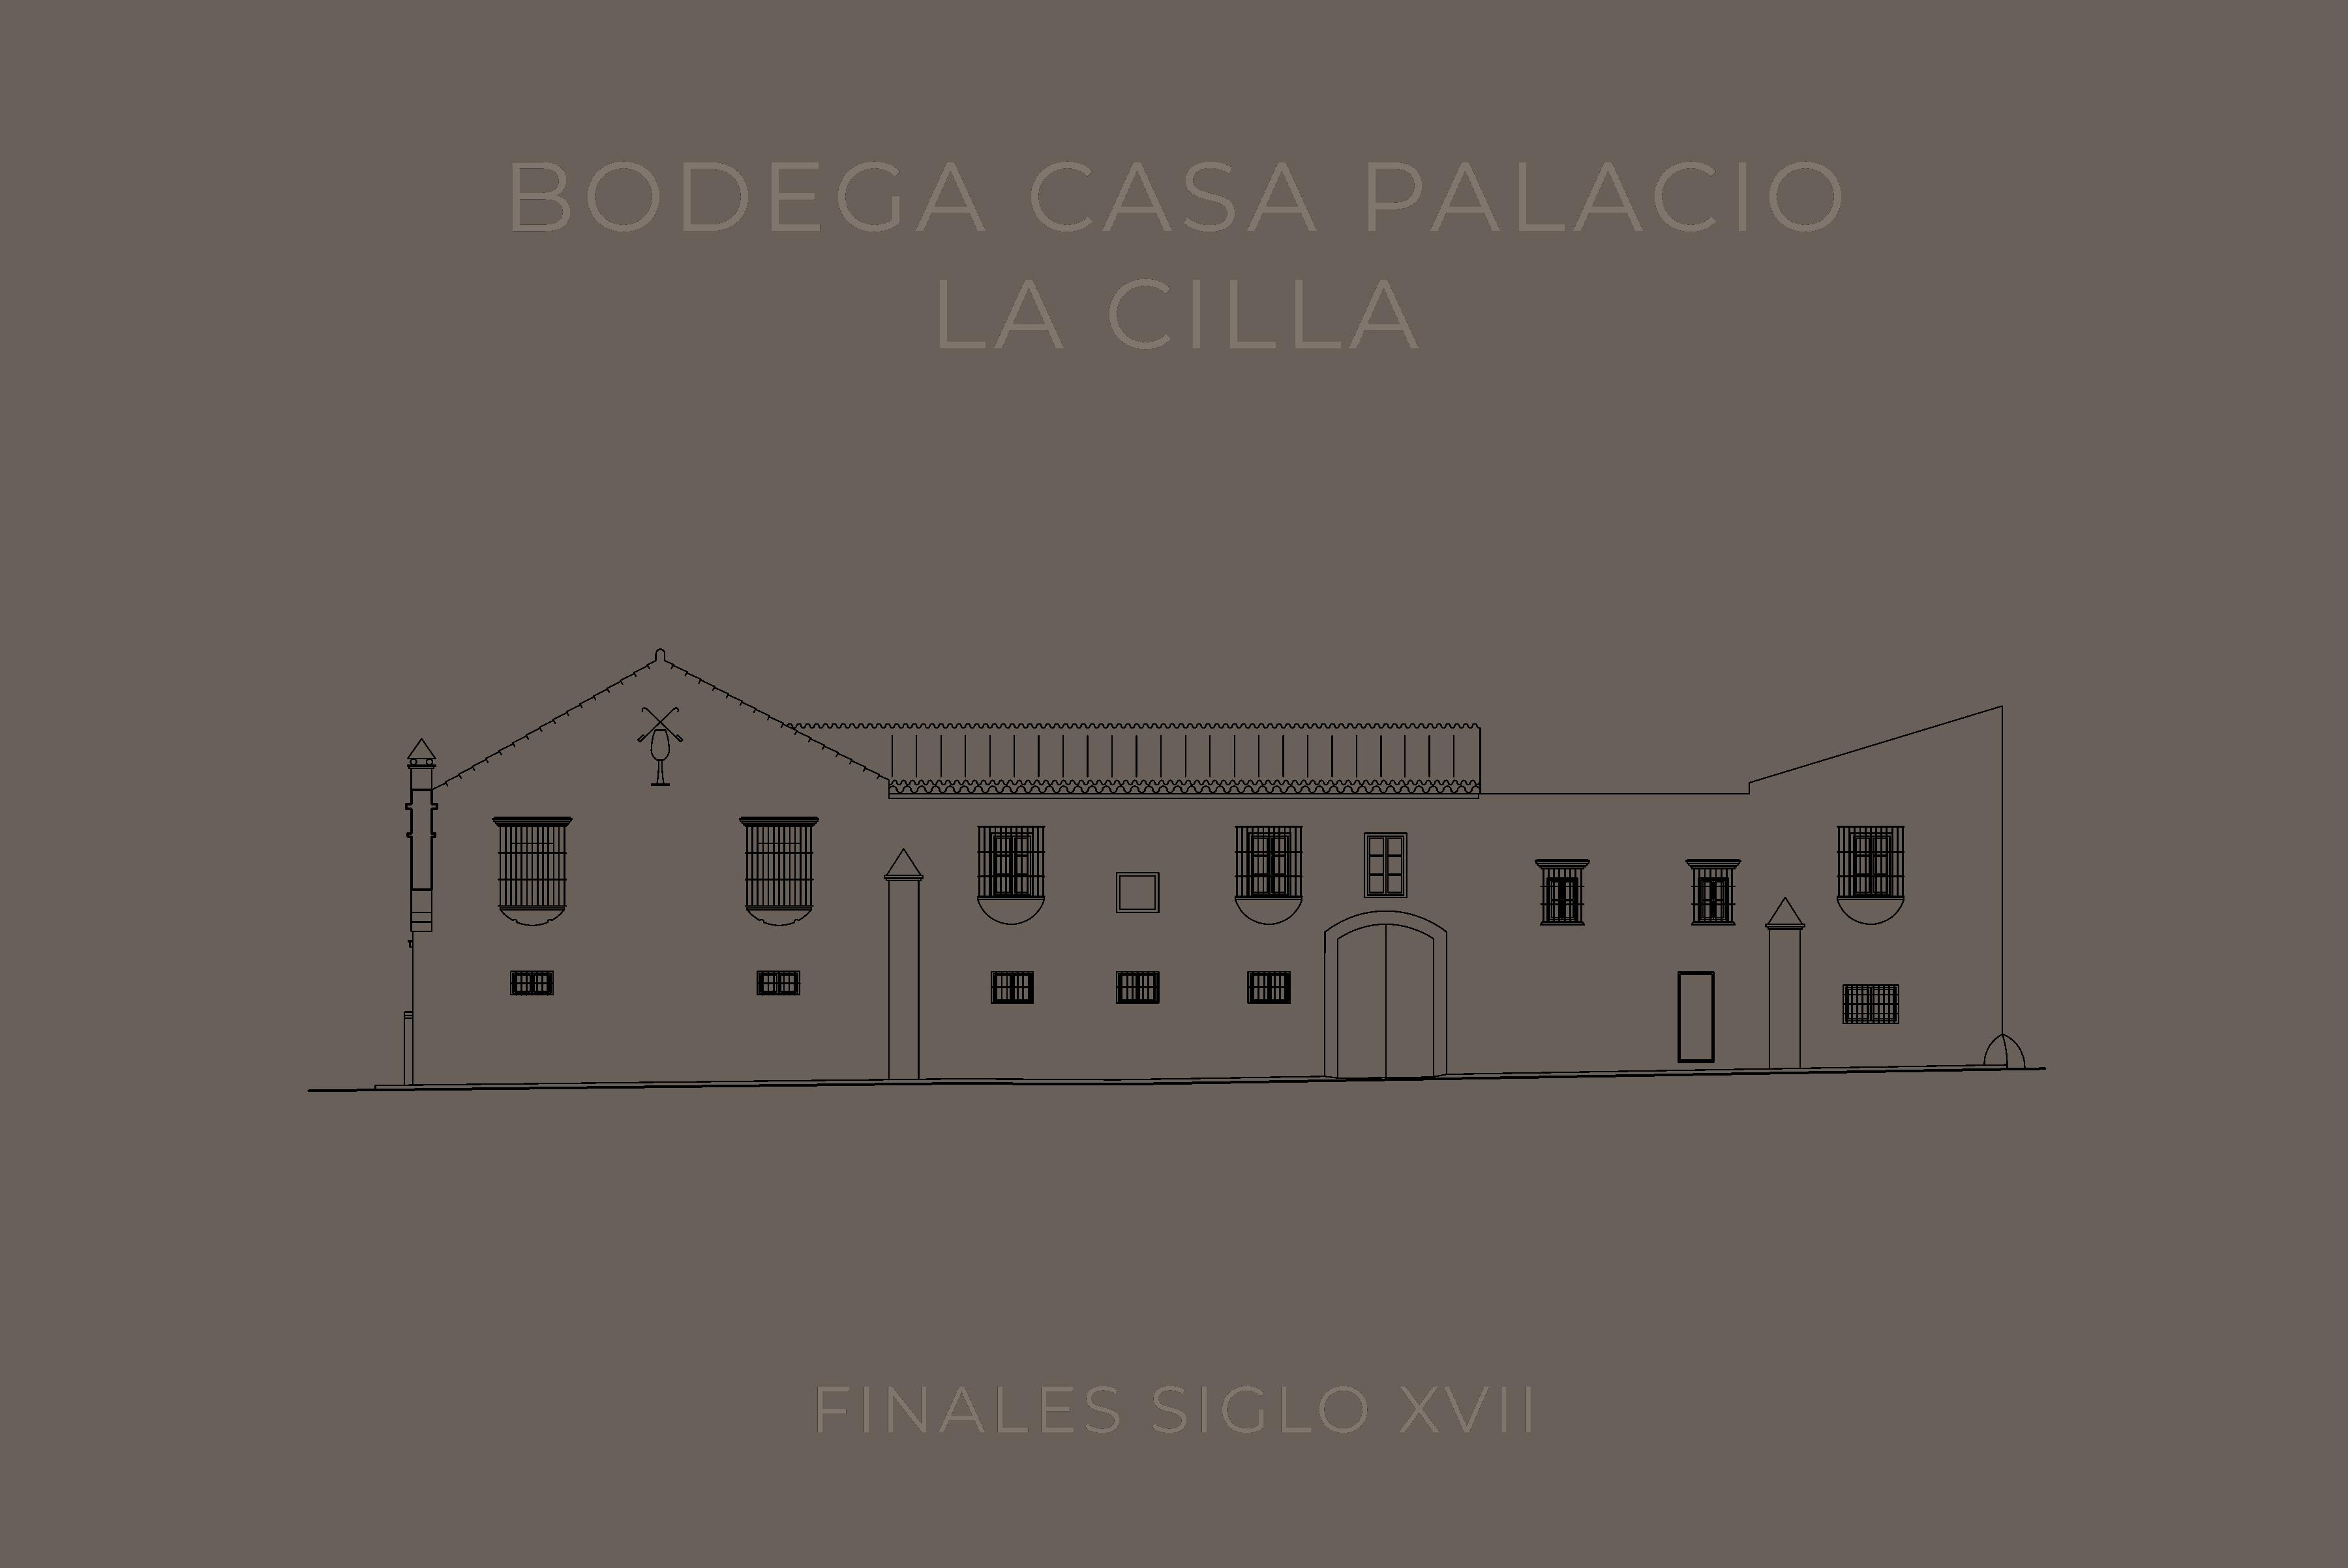 Bodega_Casa_Palacio_La_Cilla